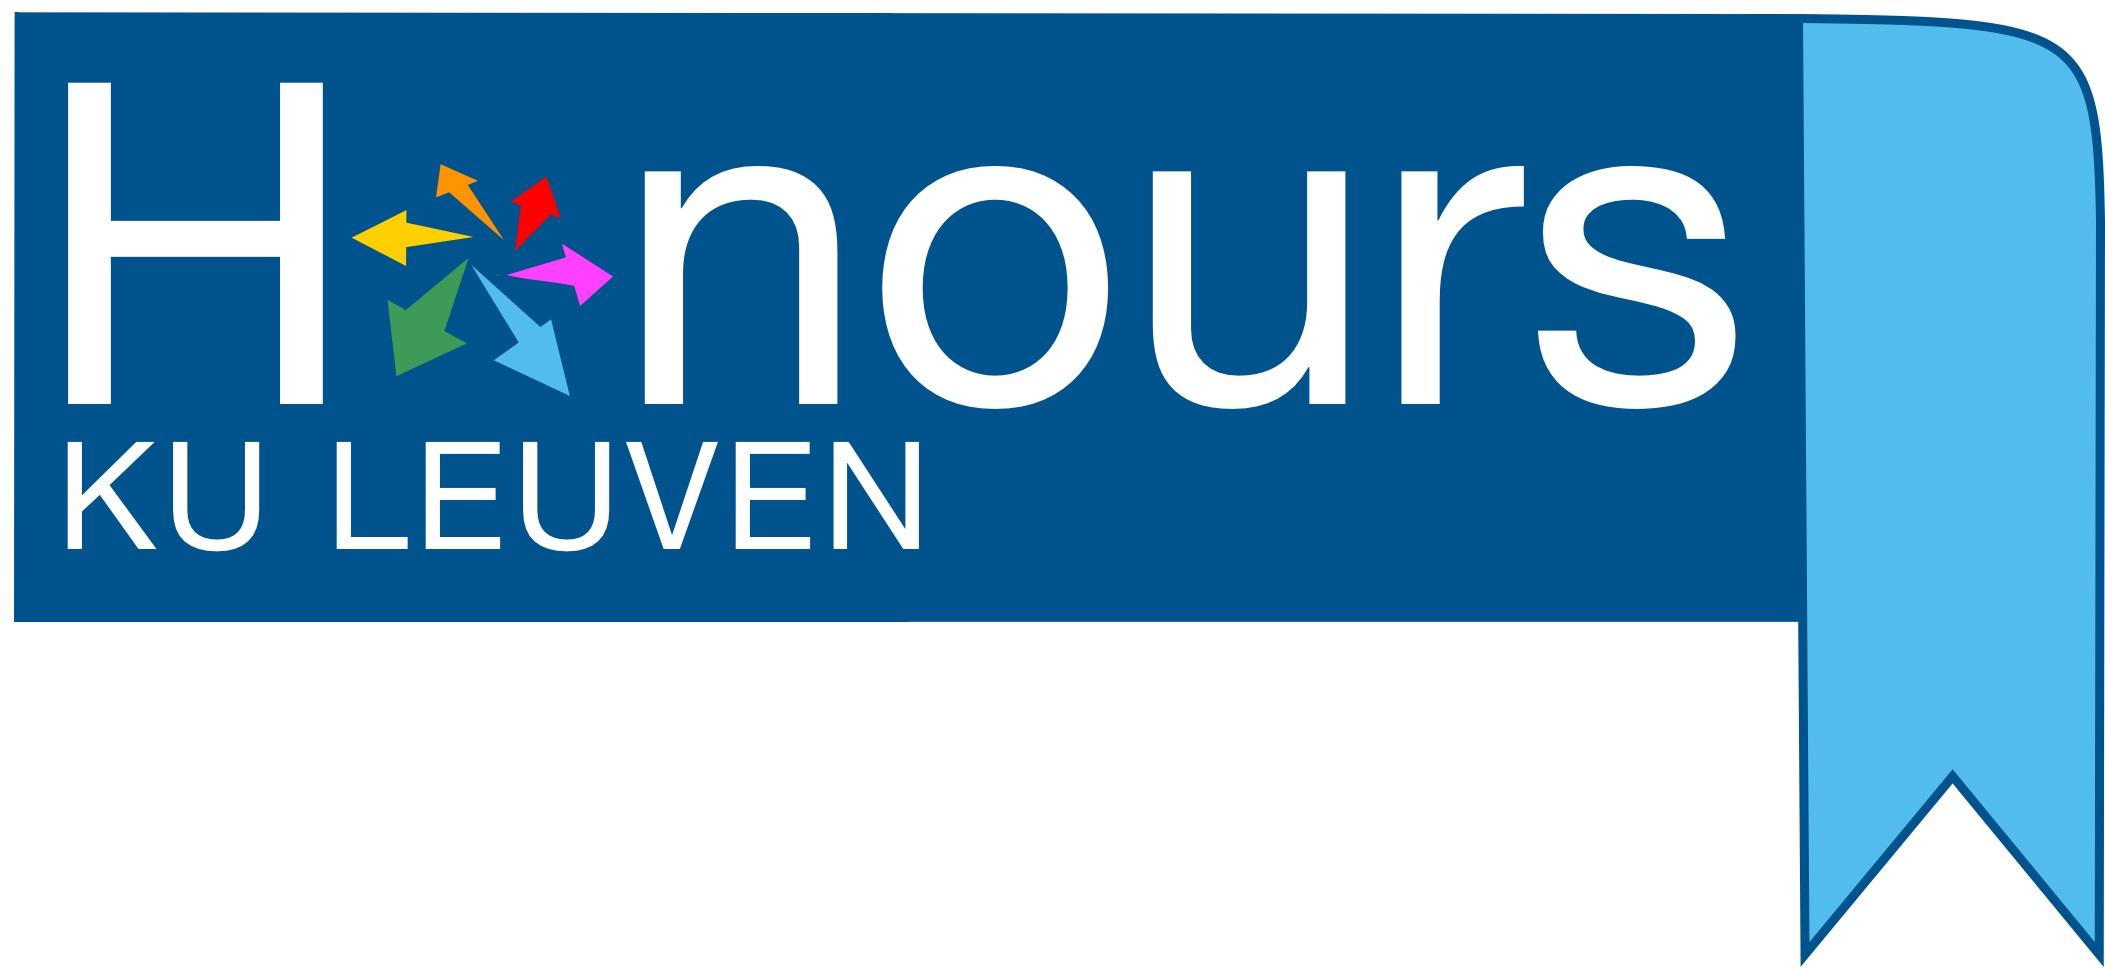 Honoursprogramma – Faculteit Wetenschappen KU Leuven